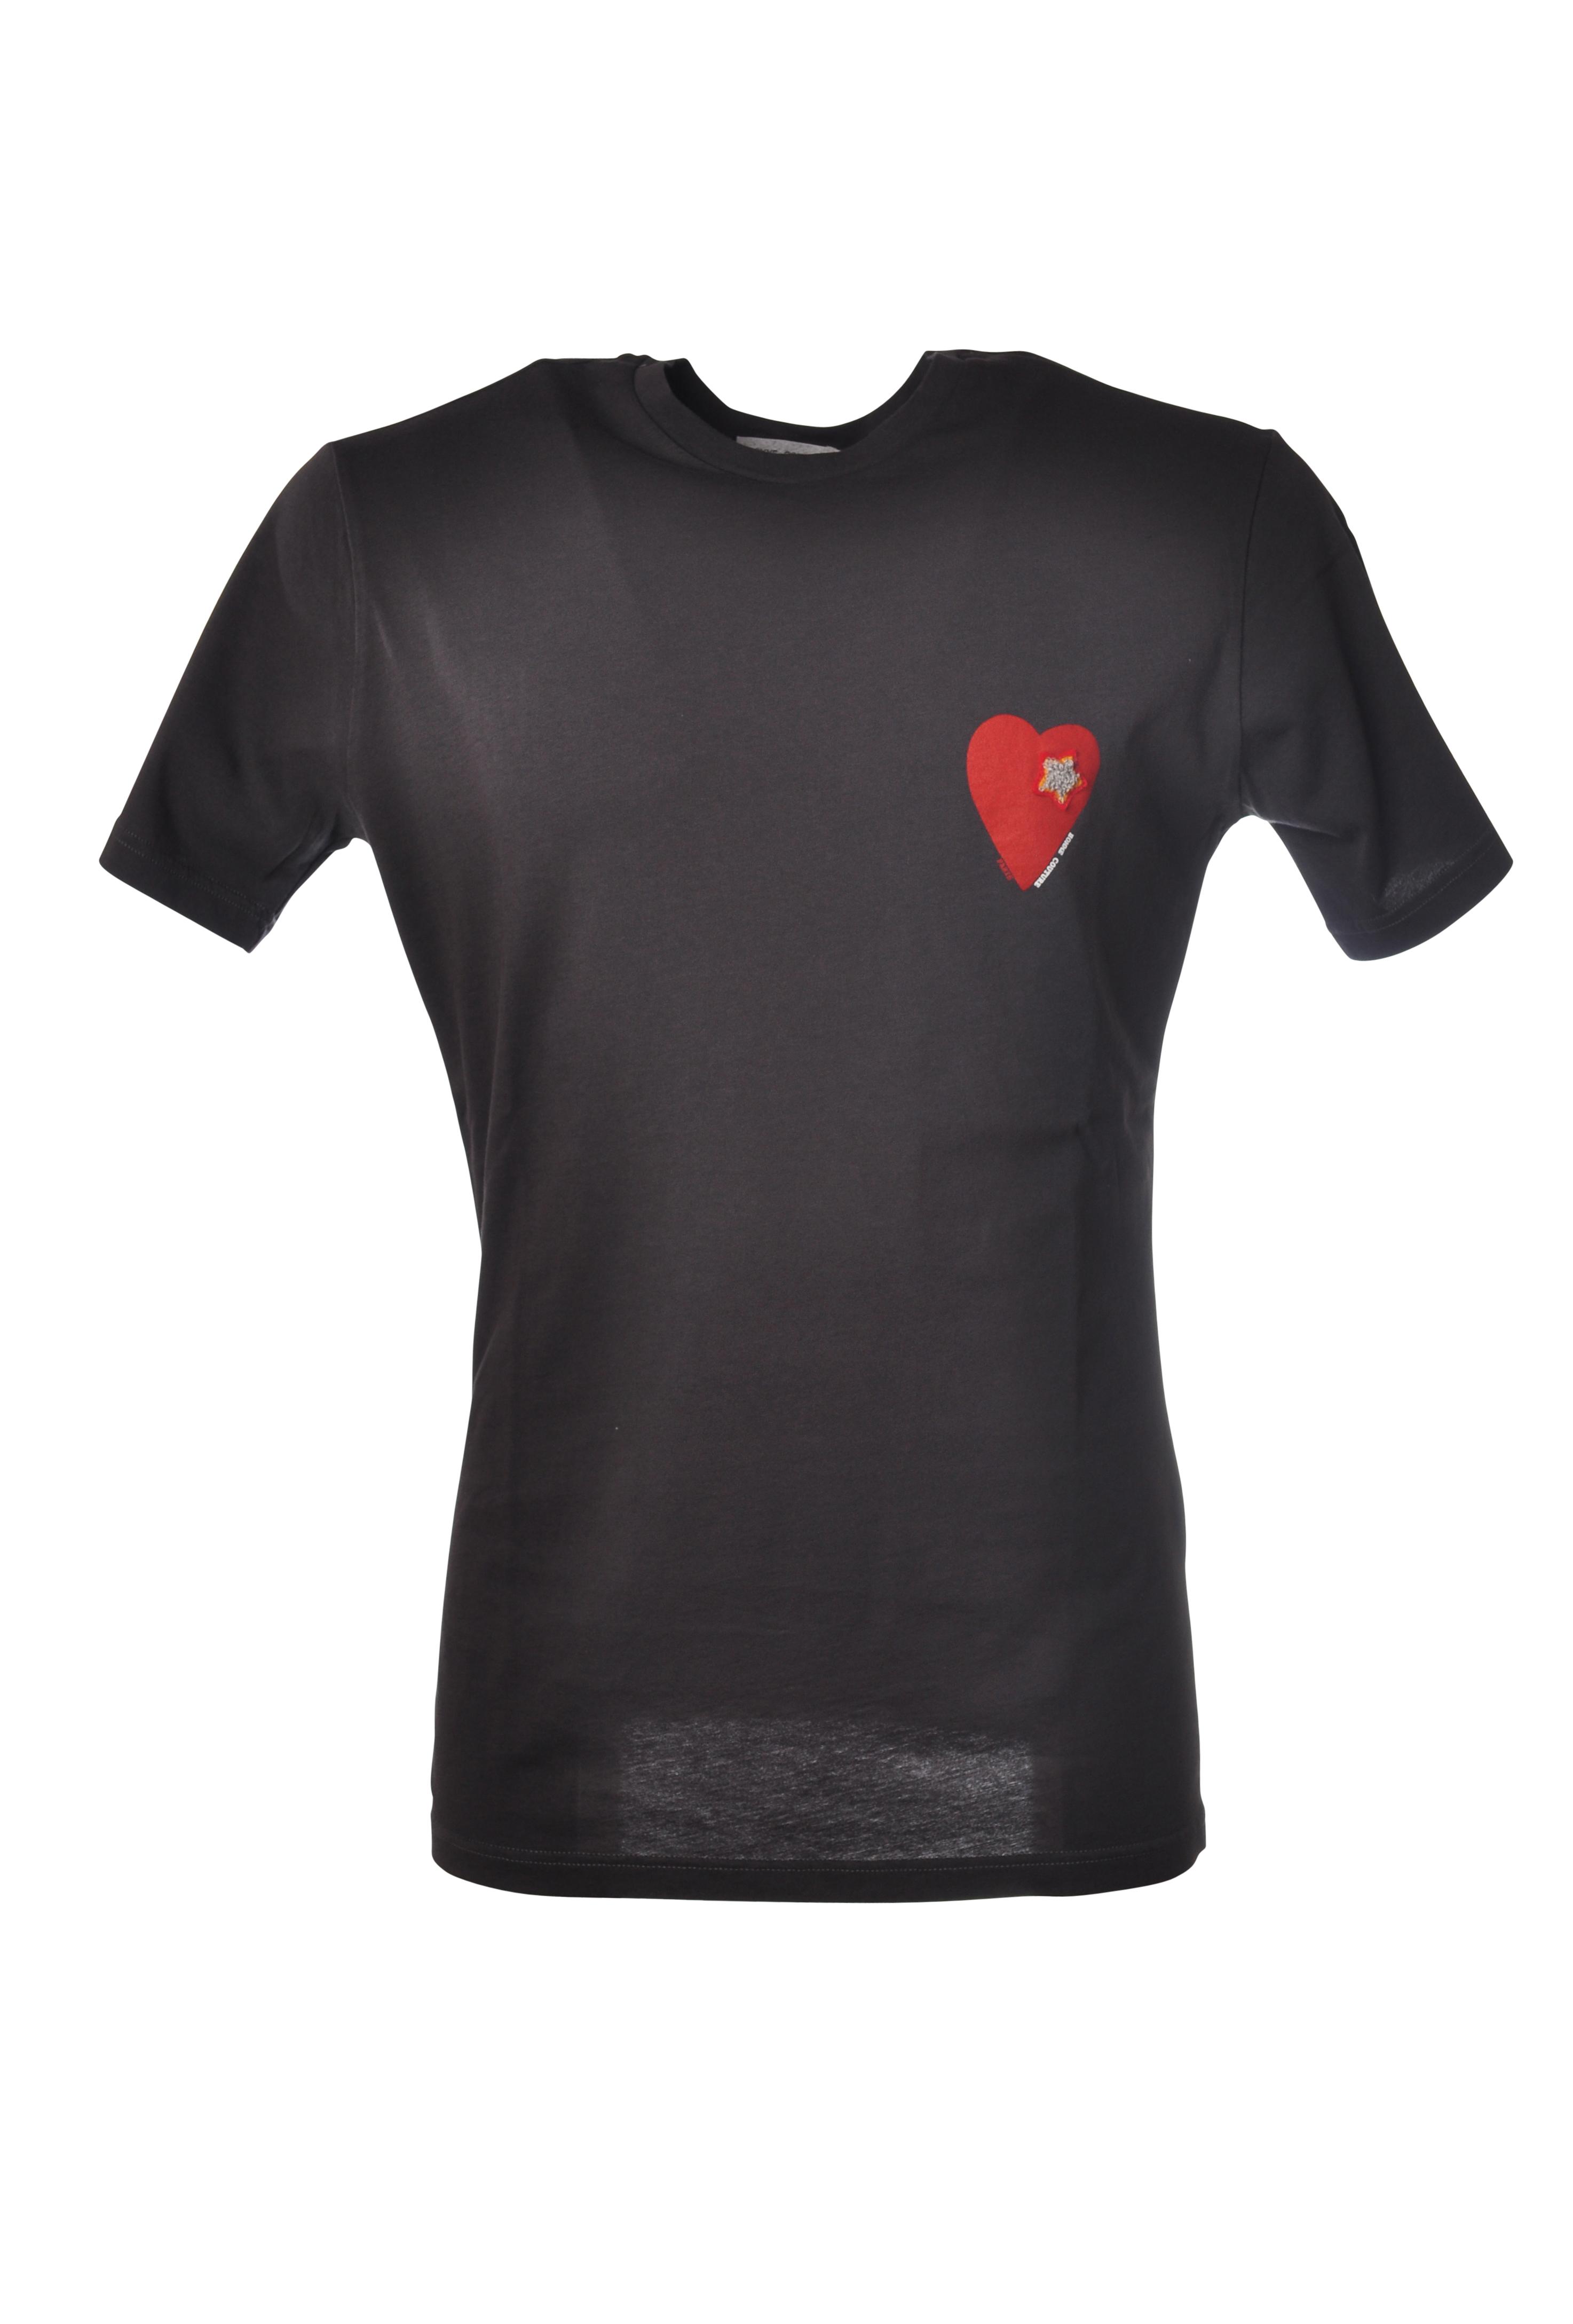 Daniele Alessandrini - Topwear-T-shirts - Mann - grey - 5288407C194511